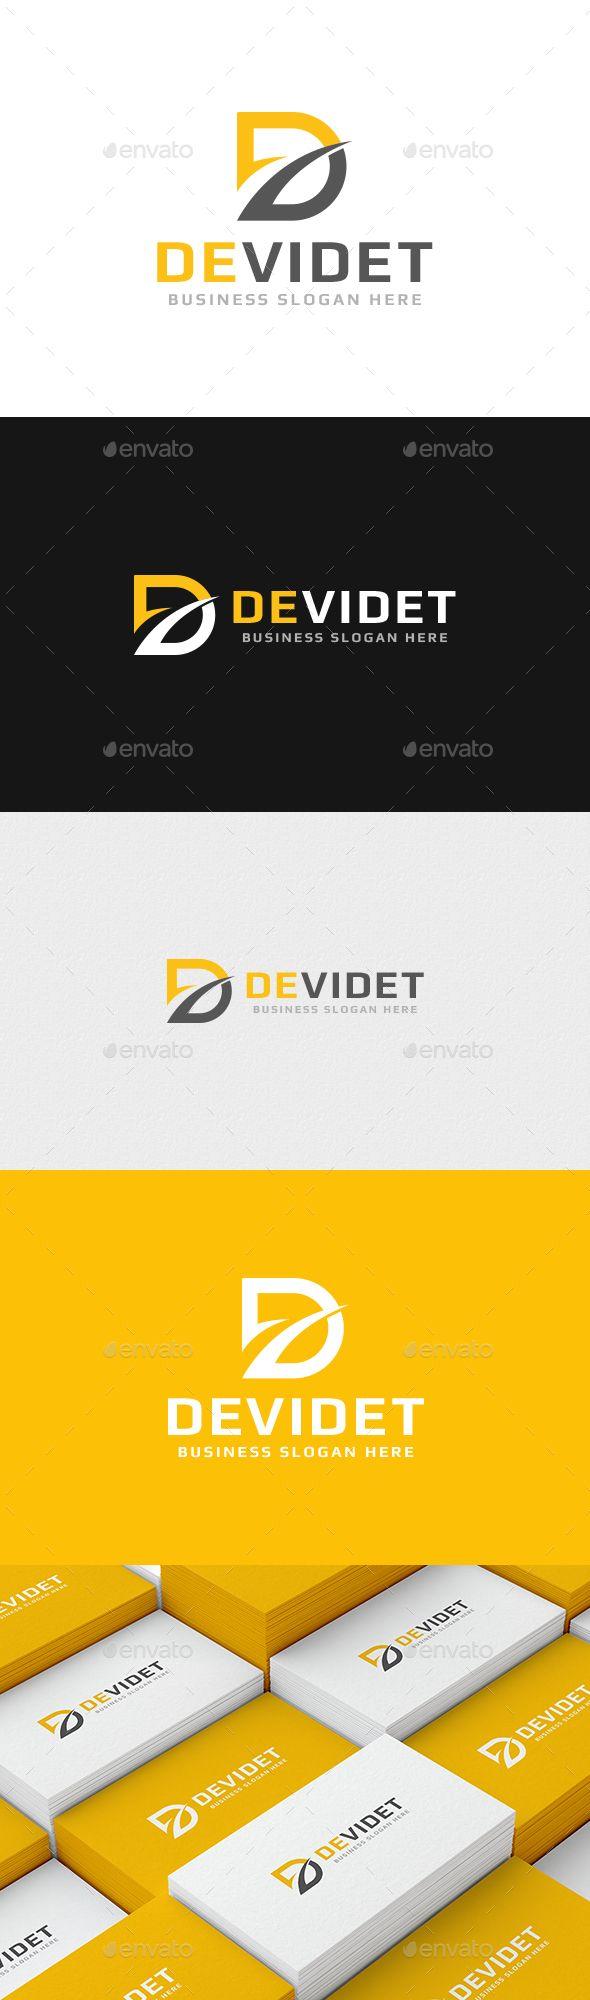 387 best logo design images on pinterest logo design template devidet d letter logo letterhead templatelogo spiritdancerdesigns Choice Image